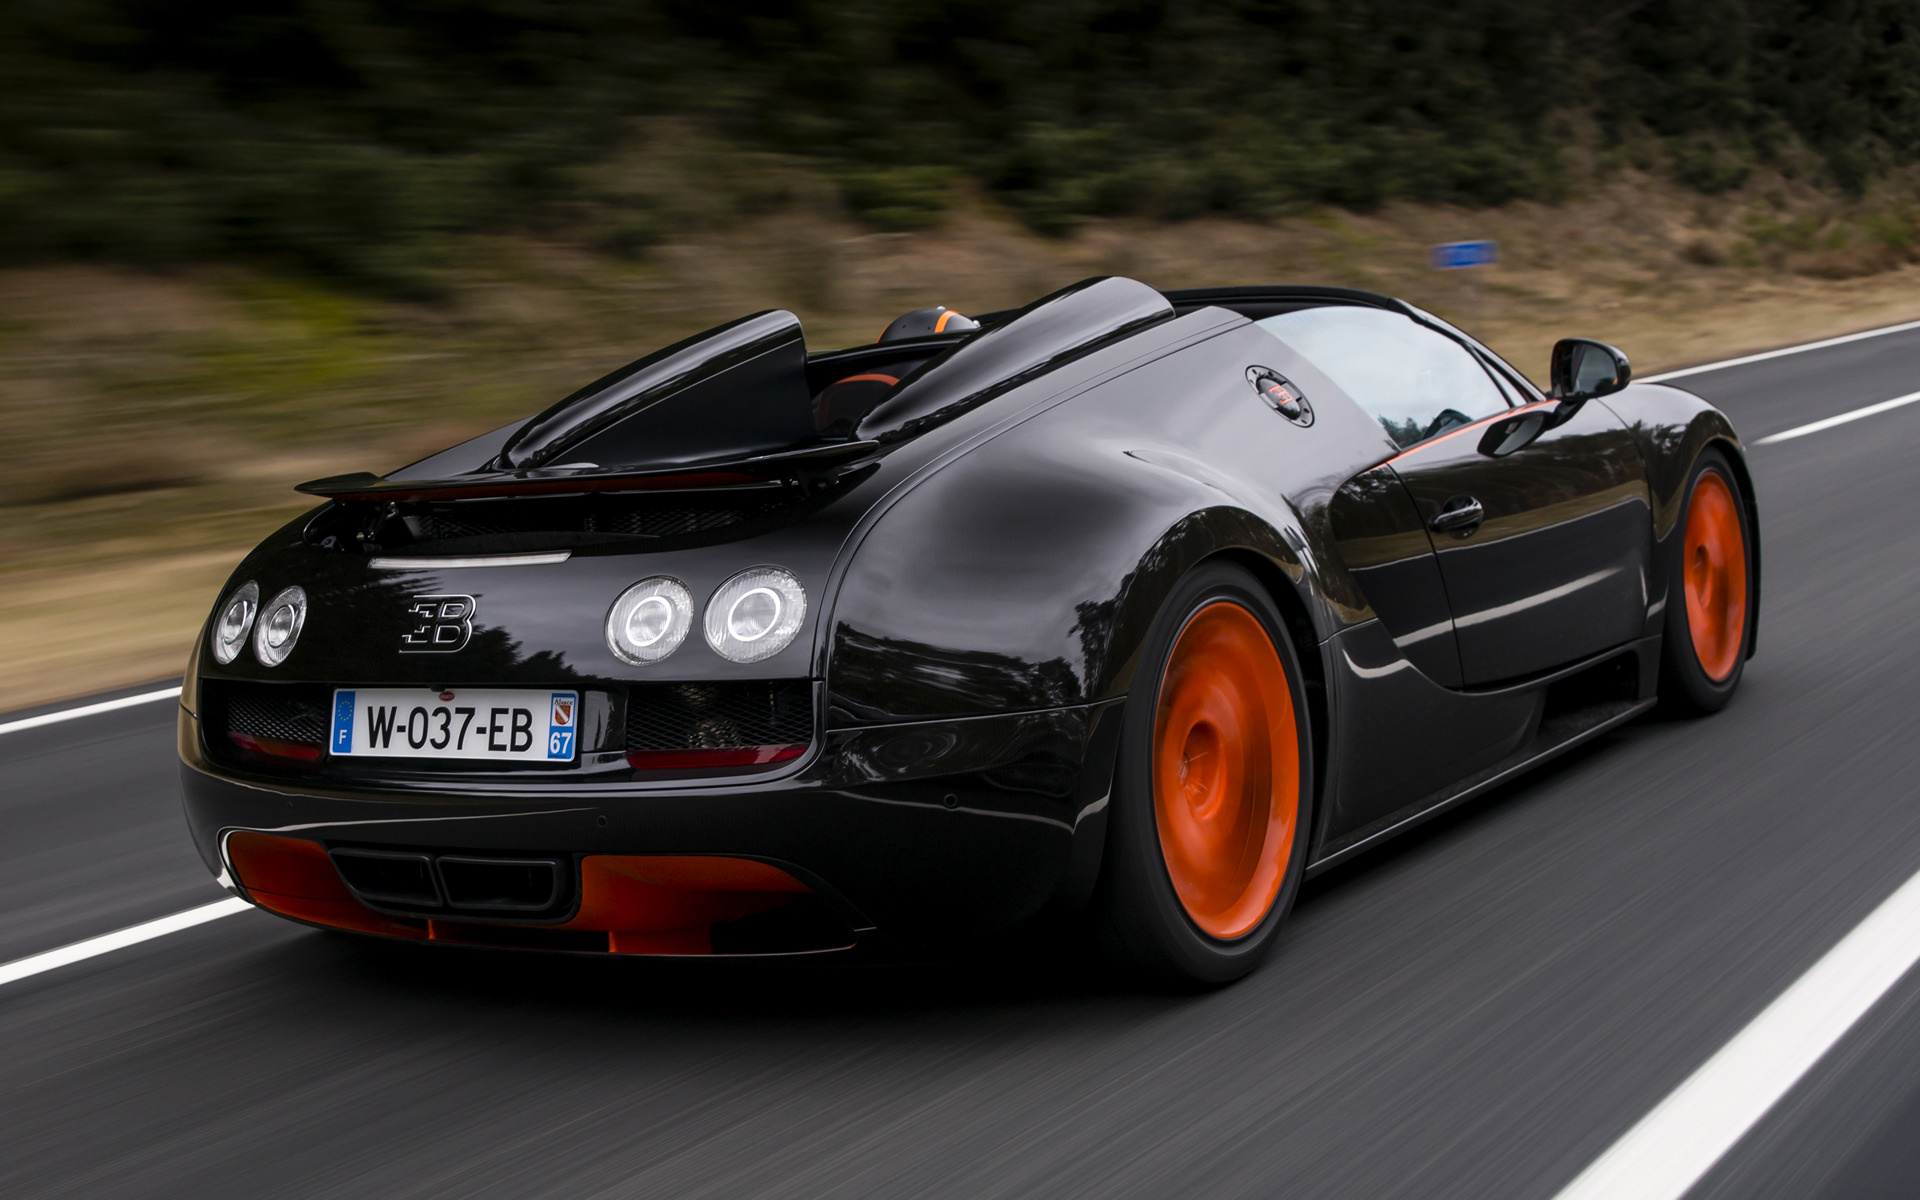 bugatti-veyron-grand-sport-vitesse-wrc-edition-car-wallpaper-41137 Inspiring Bugatti Veyron Grand Sport Vitesse Wrc Cars Trend